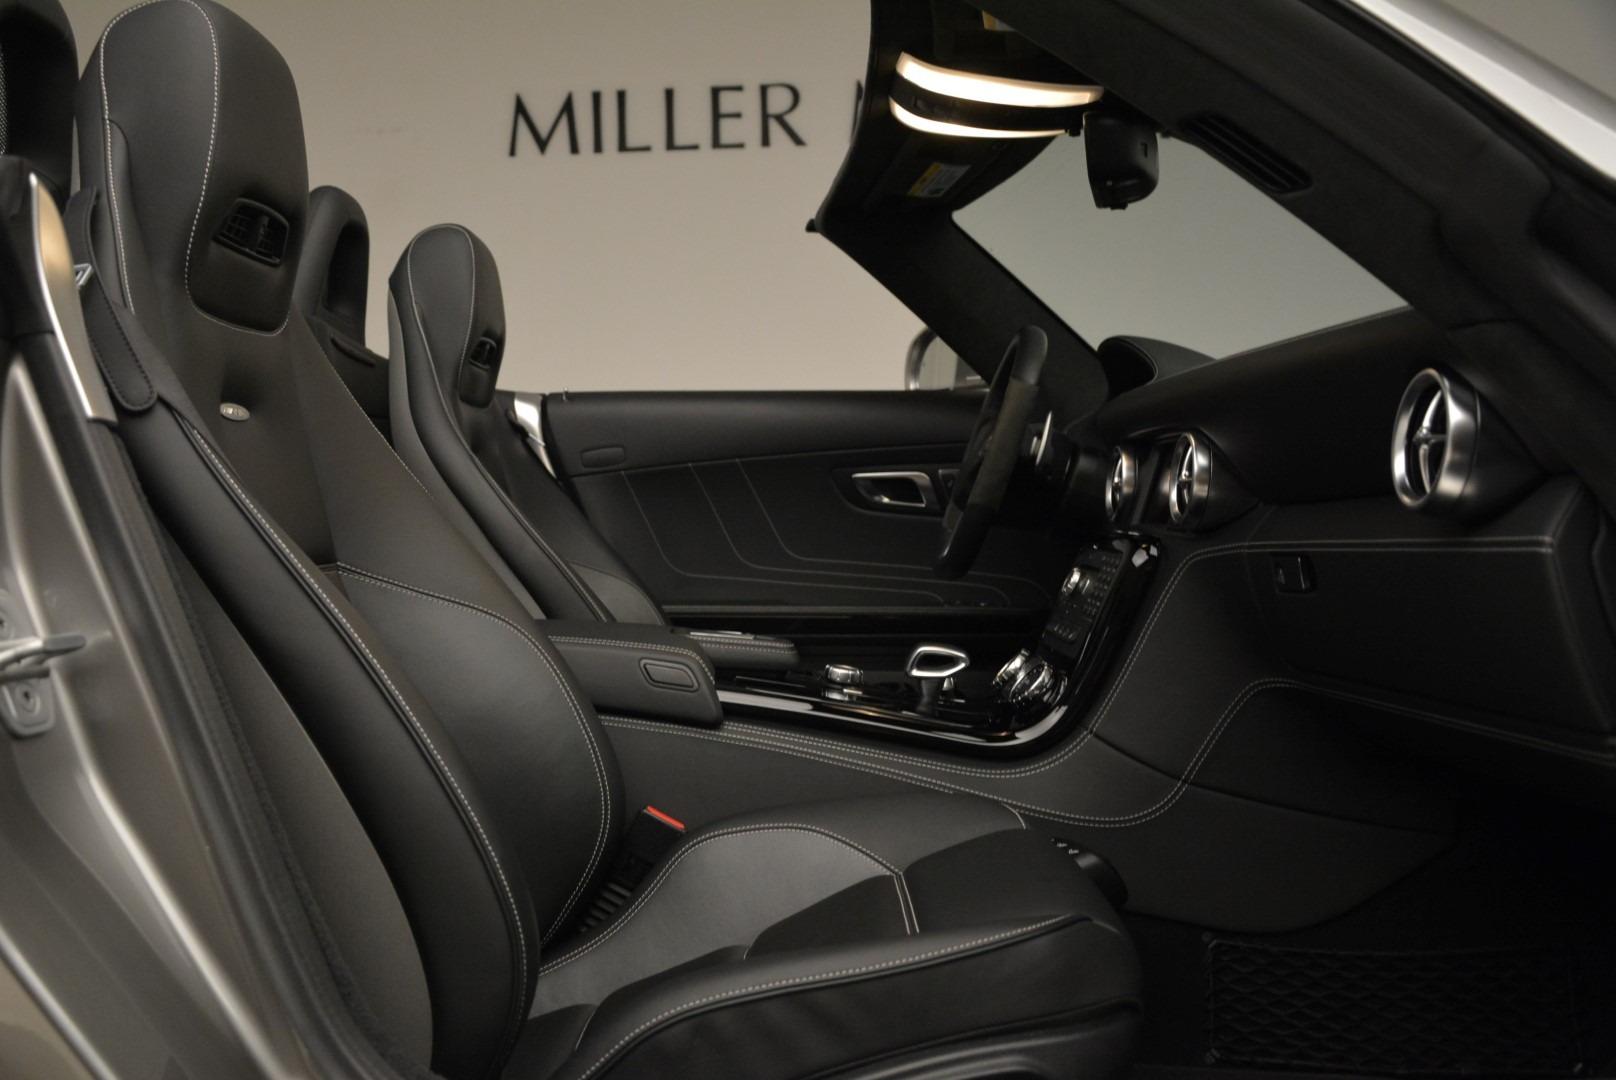 Used 2012 Mercedes-Benz SLS AMG  For Sale In Westport, CT 2068_p27